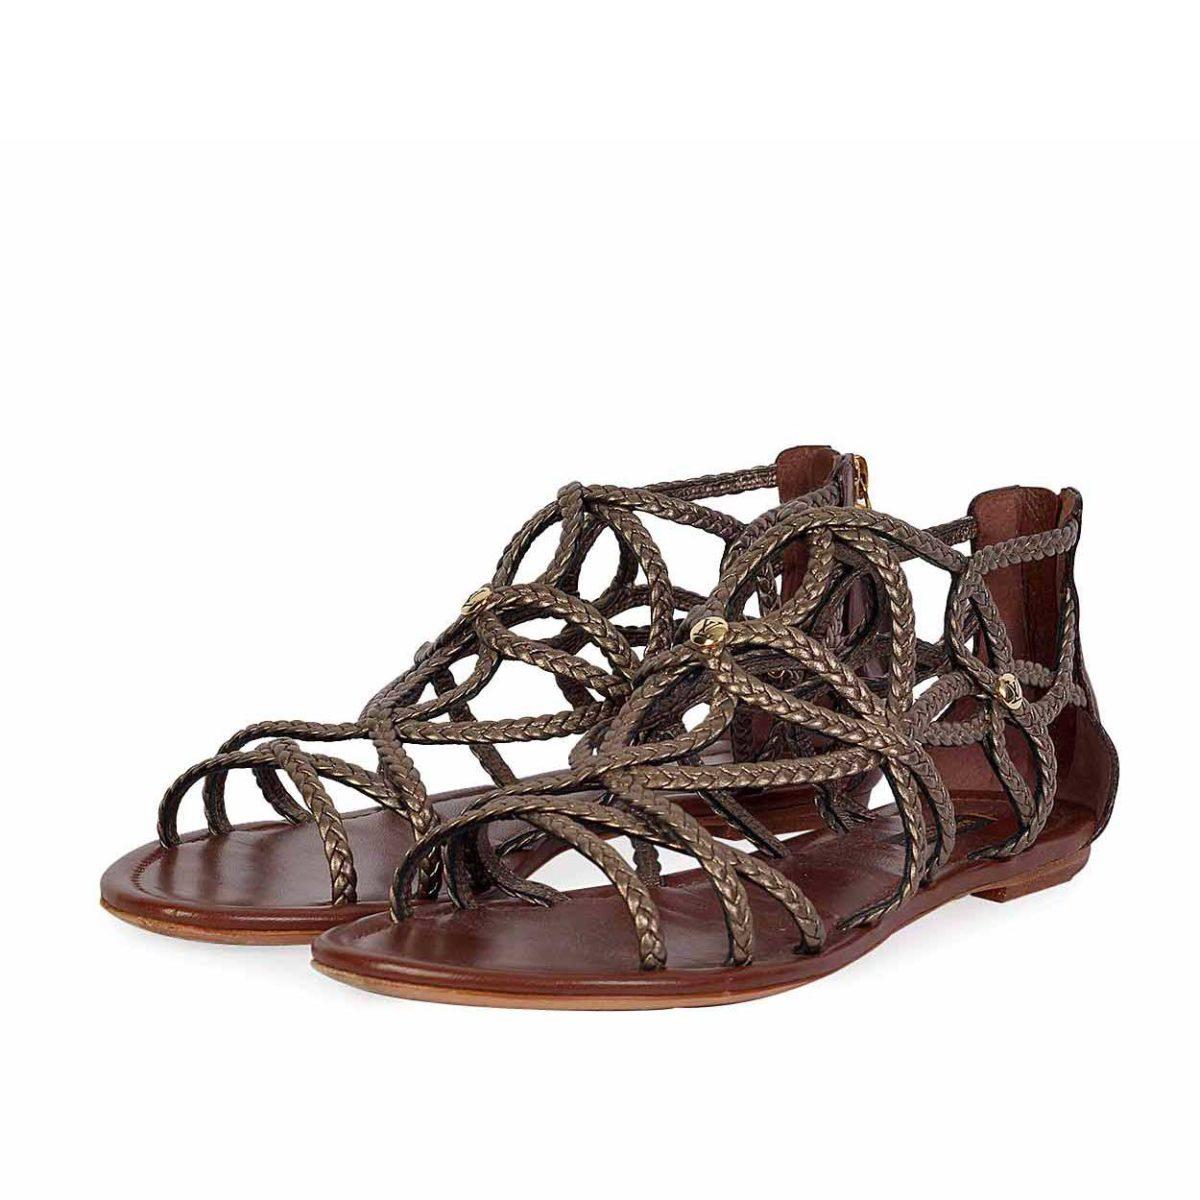 dab929de4 LOUIS VUITTON Bronze Gladiator Flat Sandals – S  38 (5)